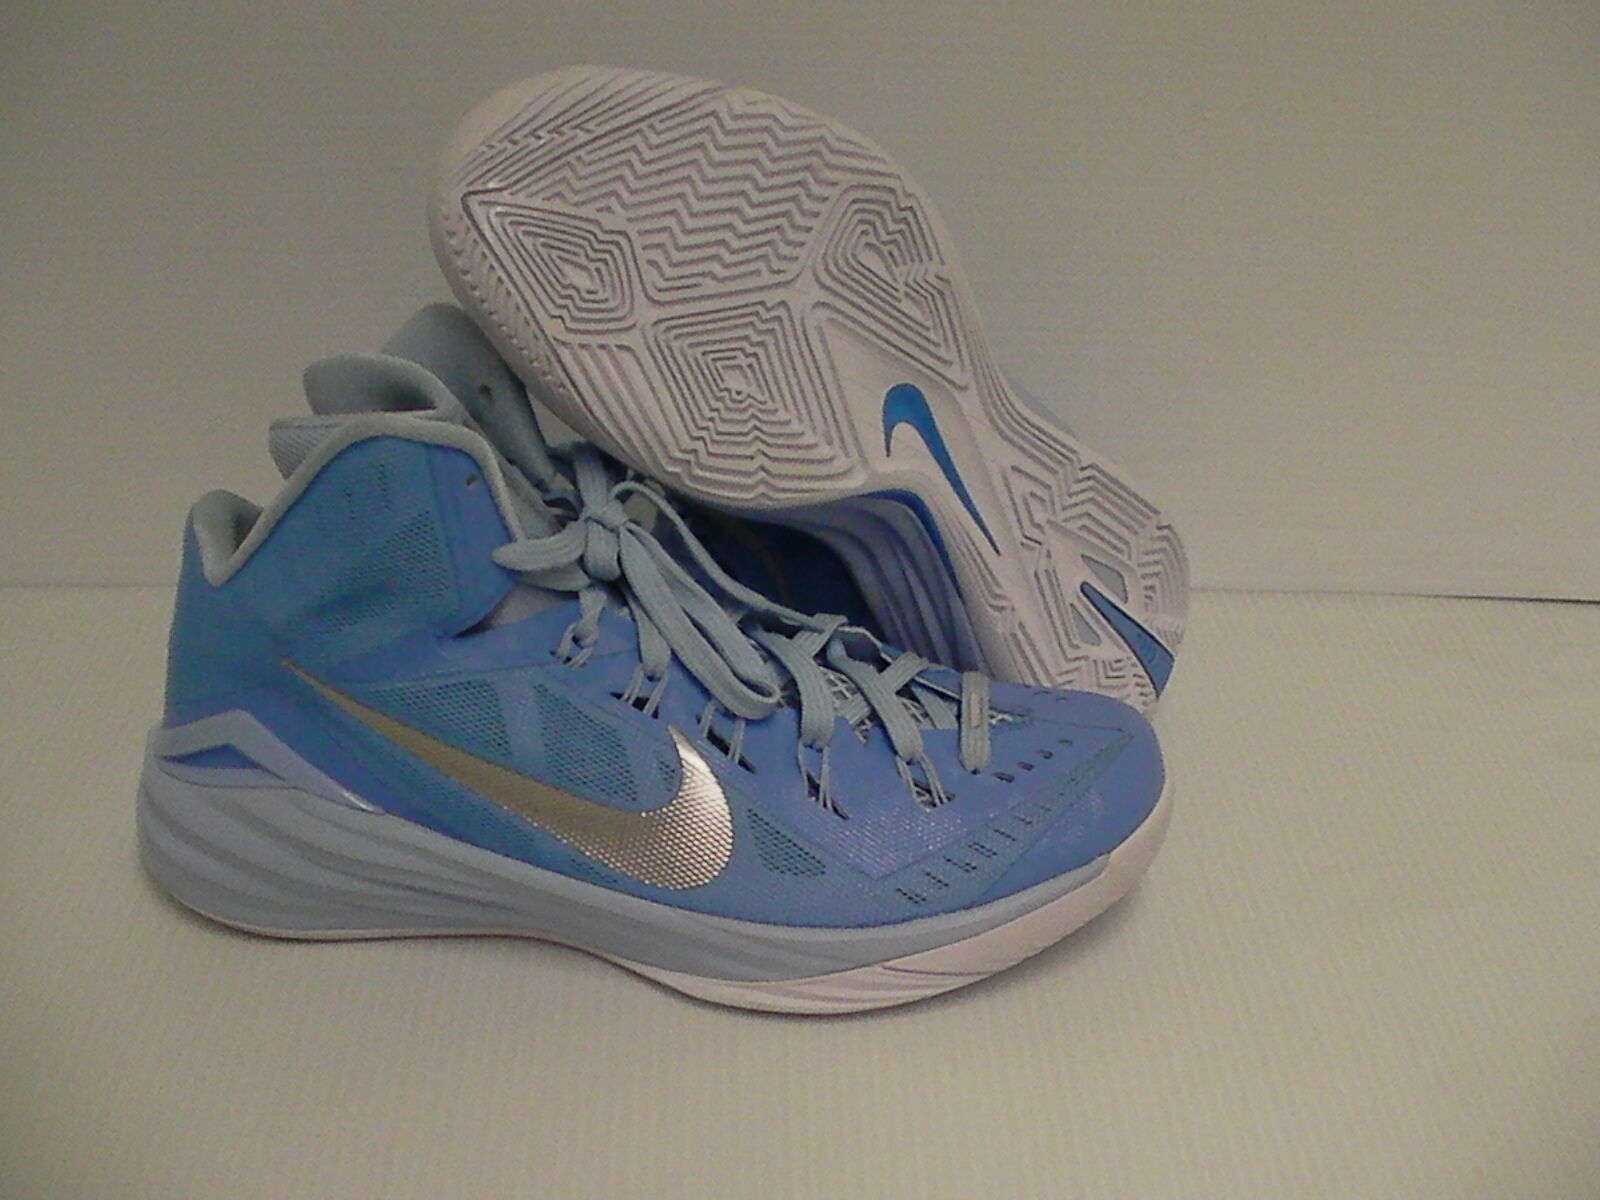 Nike hyperdunk blue baskeball shoes blue hyperdunk silver size 10 f2a7f3